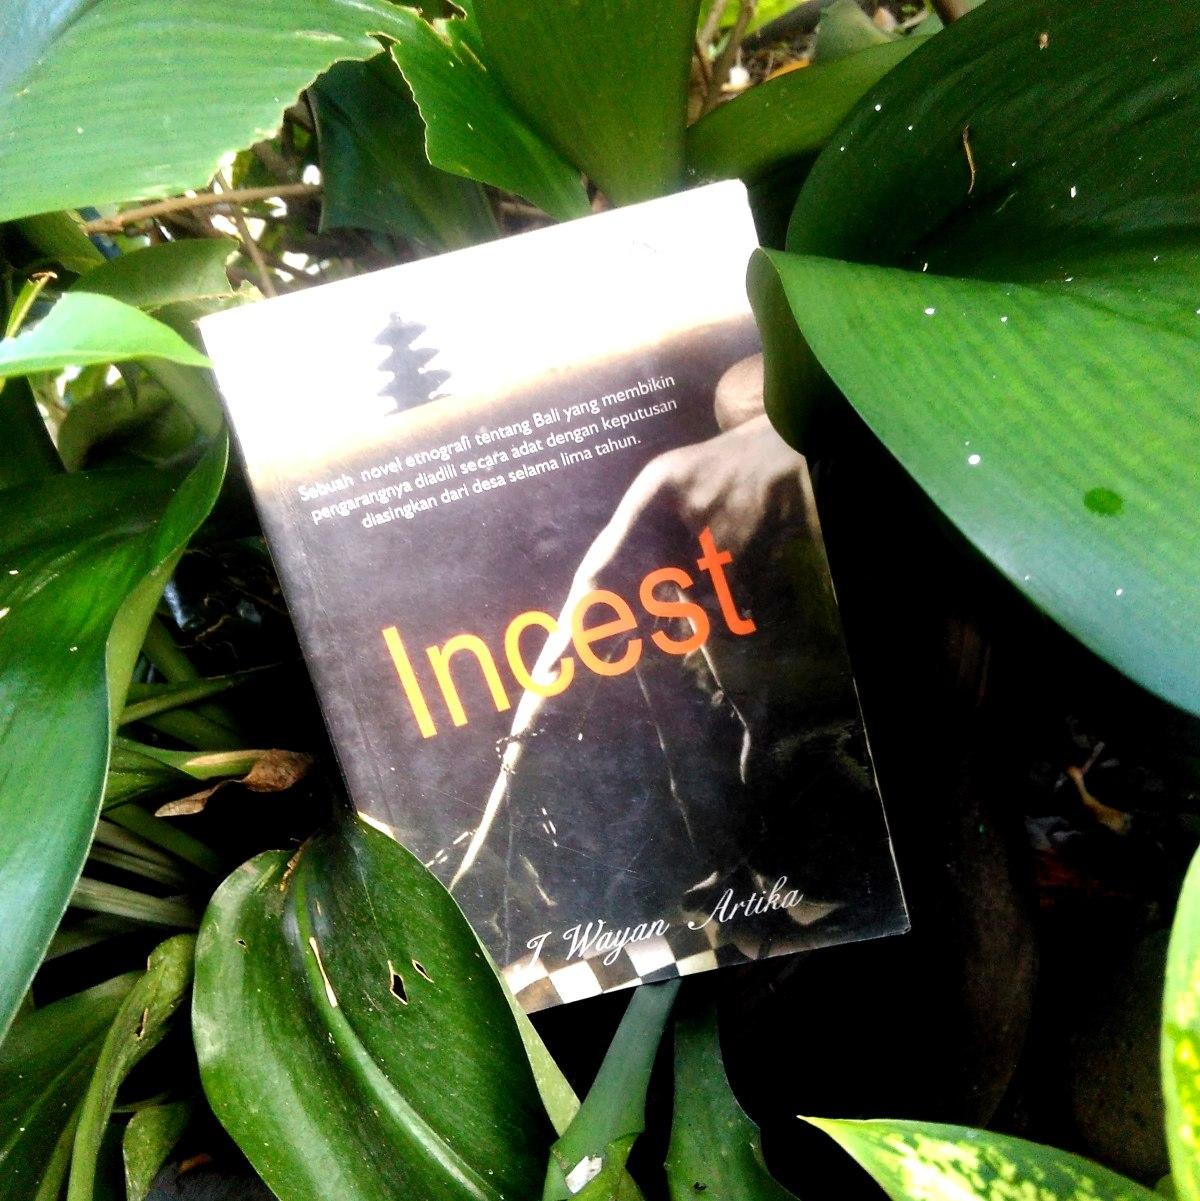 [Review buku]: Incest, ketika belitan adat terpaksa mengaburkan logika